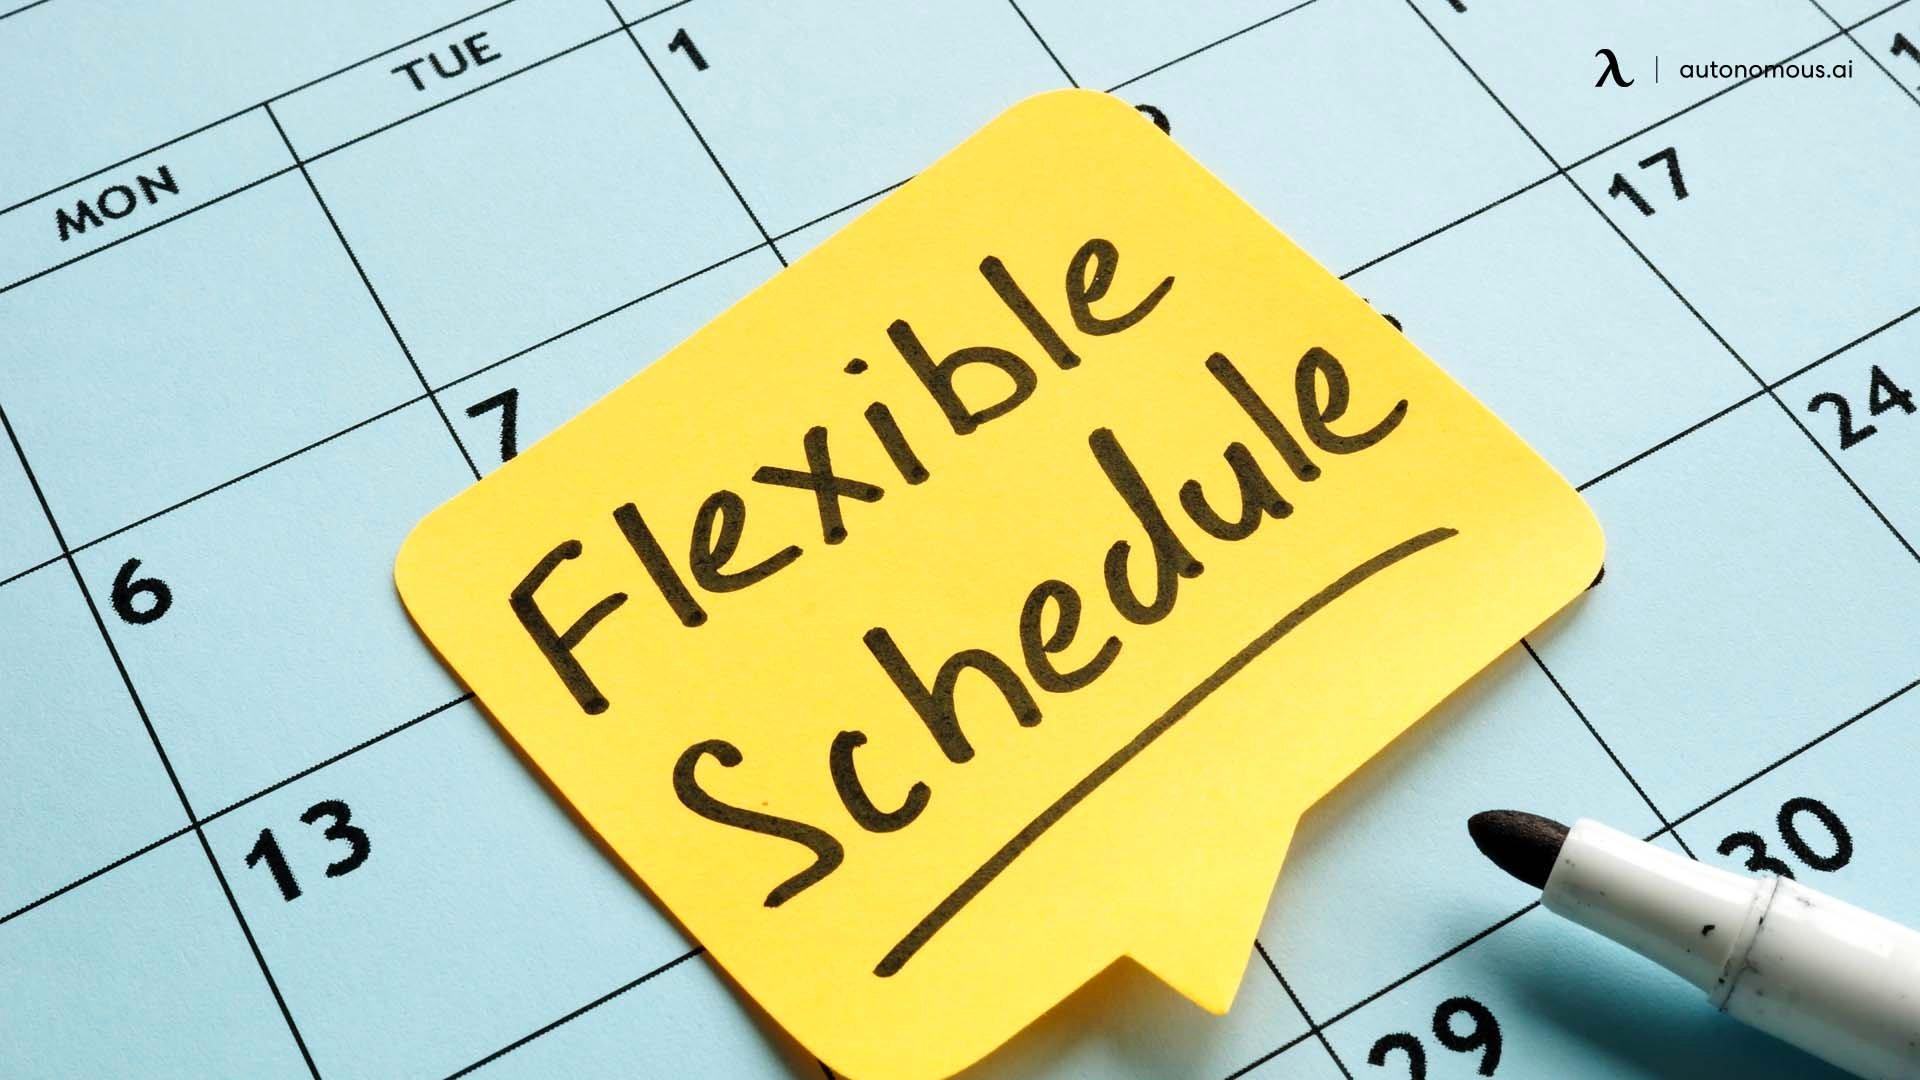 Consider offering better flextime opportunities